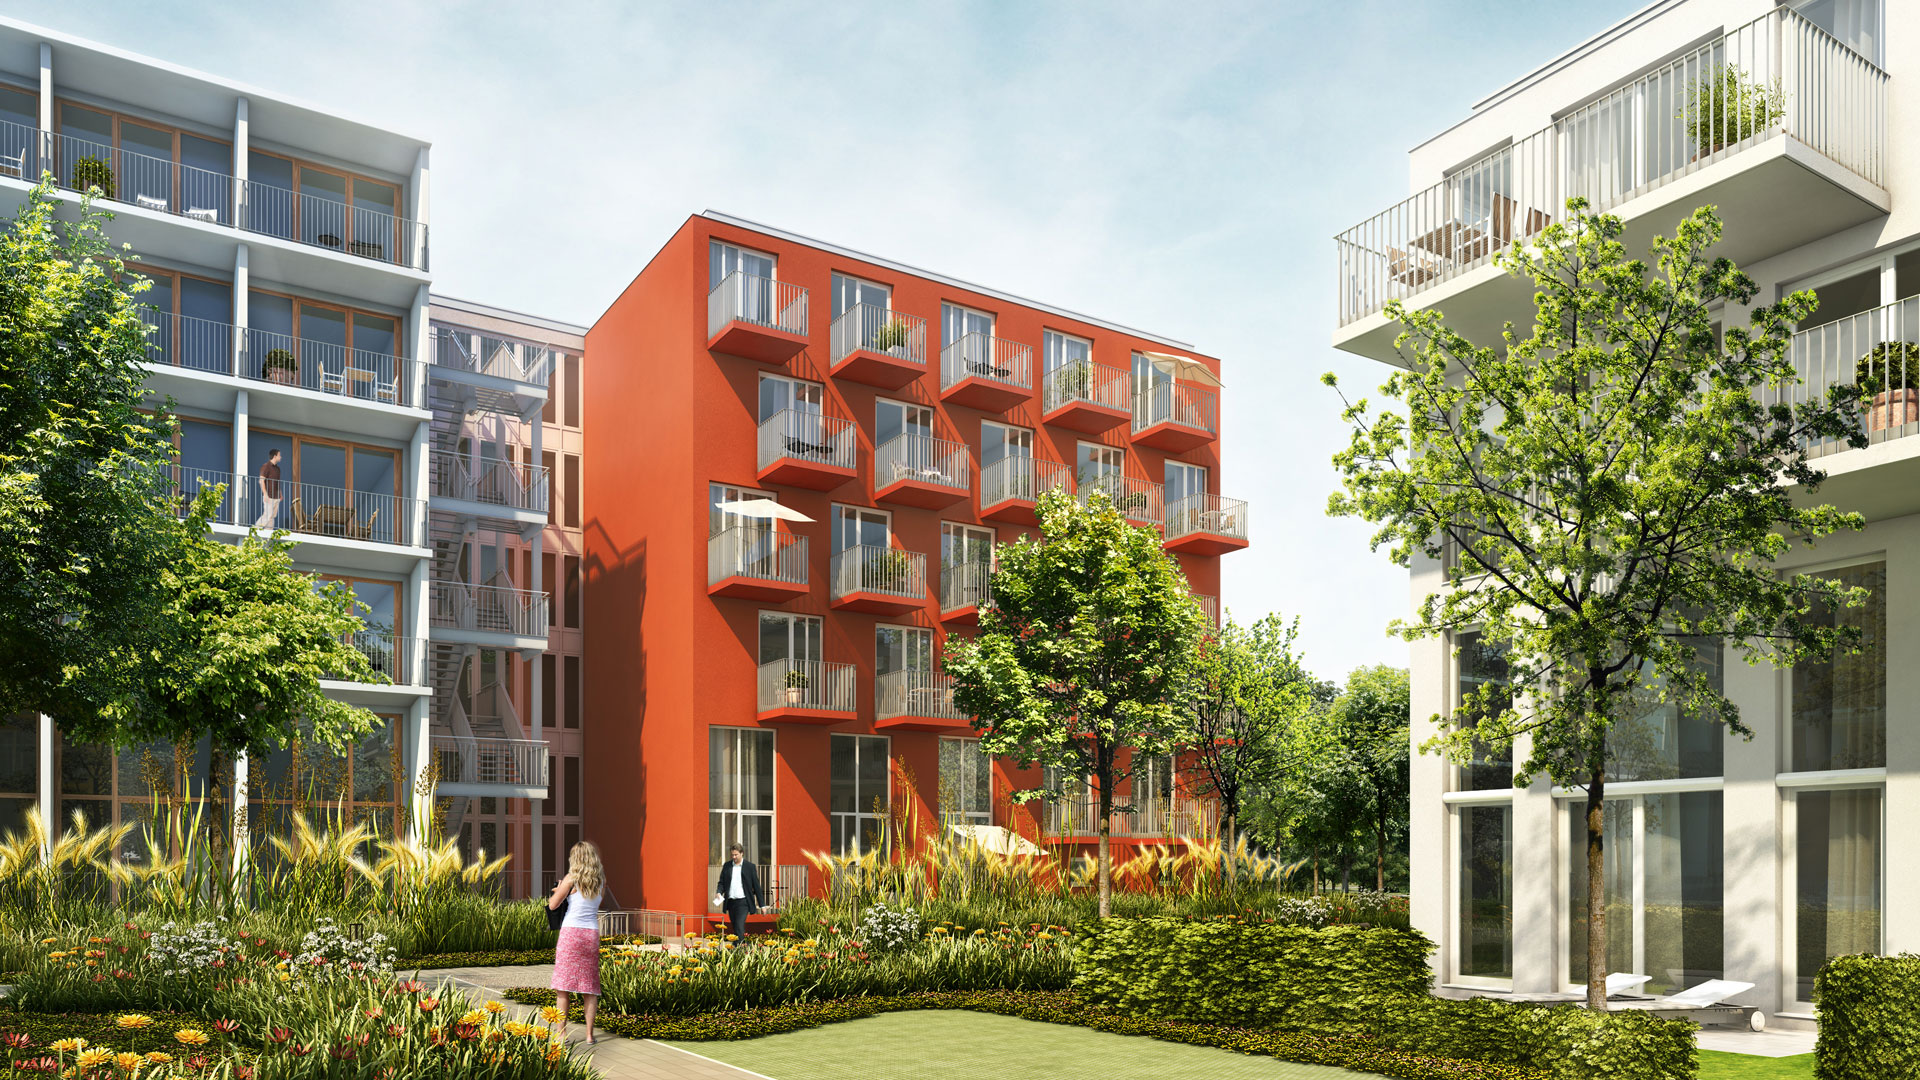 Studiomuc service apartments m nchen atelier8 barbara - Architekturburo frankfurt ...